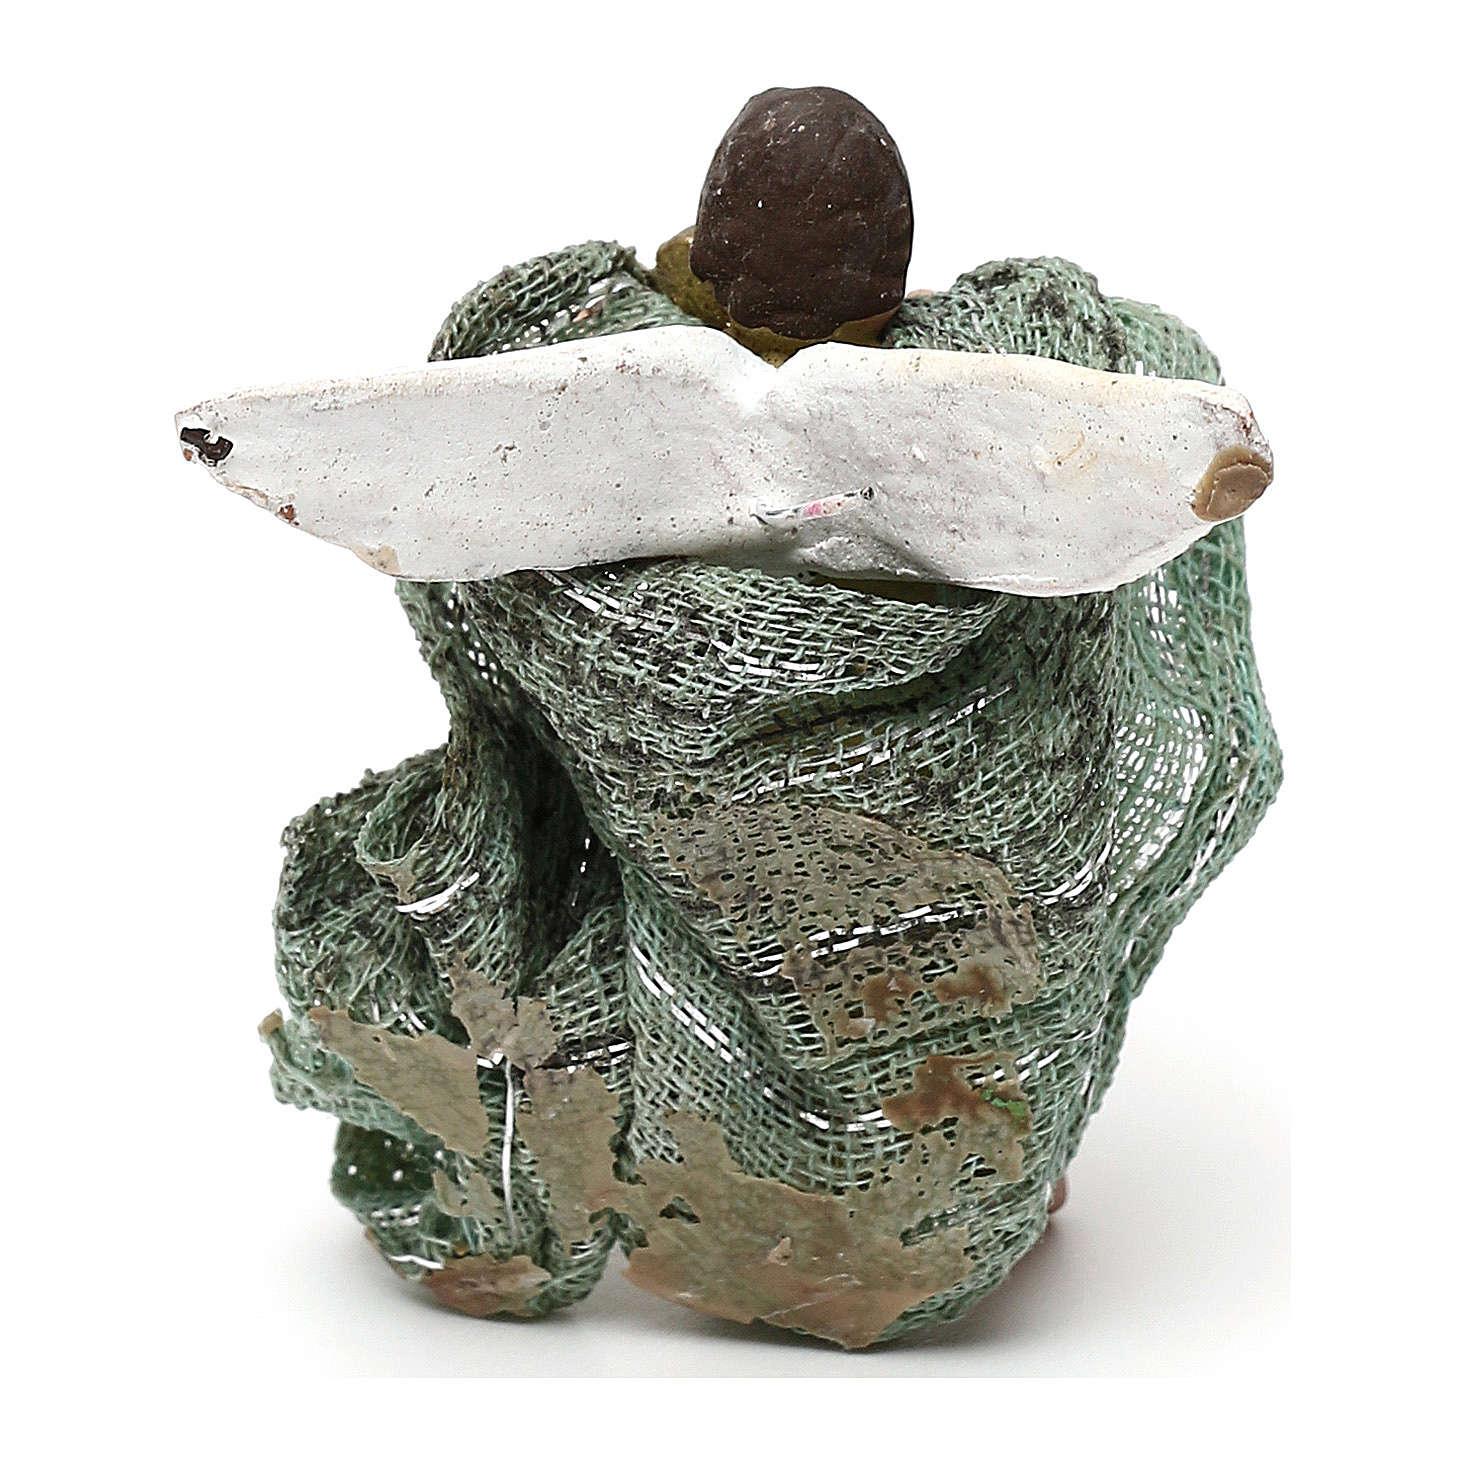 STOCK Angelo Gloria terracotta vestito 4 cm presepe napoletano 4